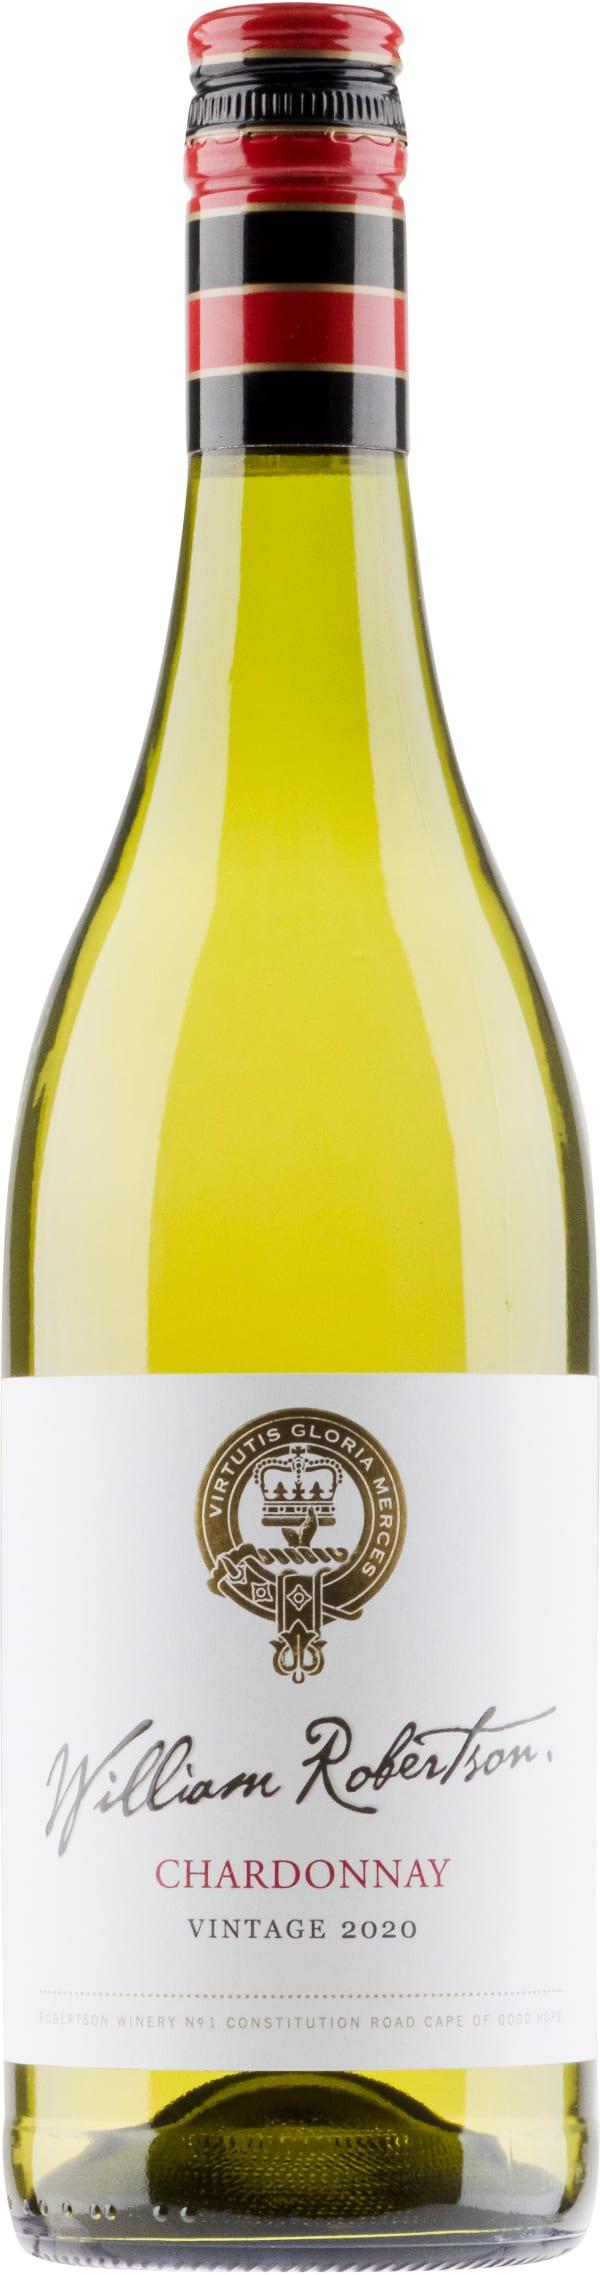 William Robertson Chardonnay 2020